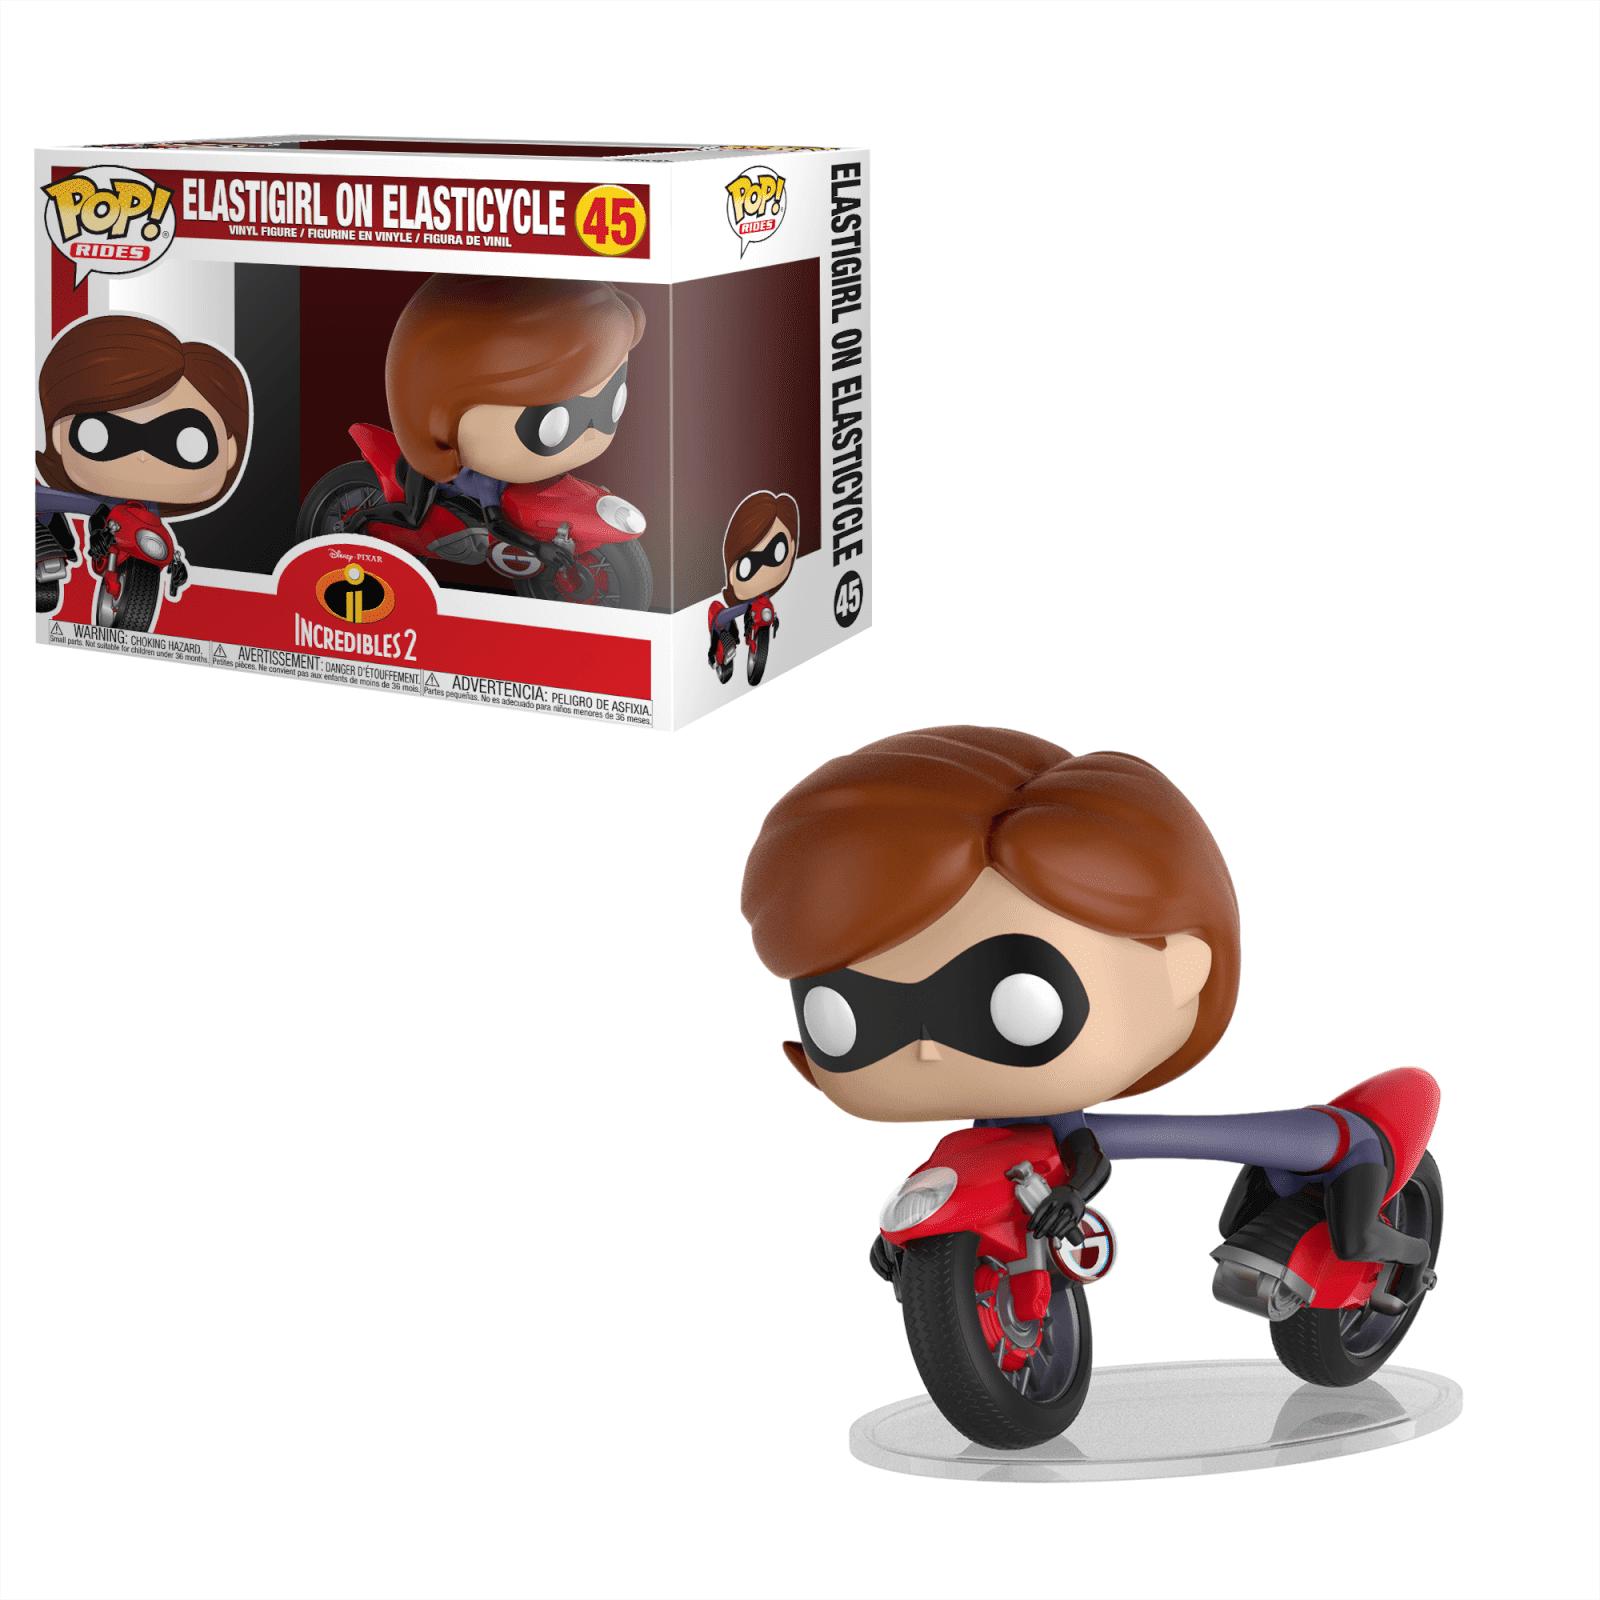 Pop! Vinyl Figurine Pop! Elastigirl sur Moto Les Indestructibles Disney - Vinyl Ride